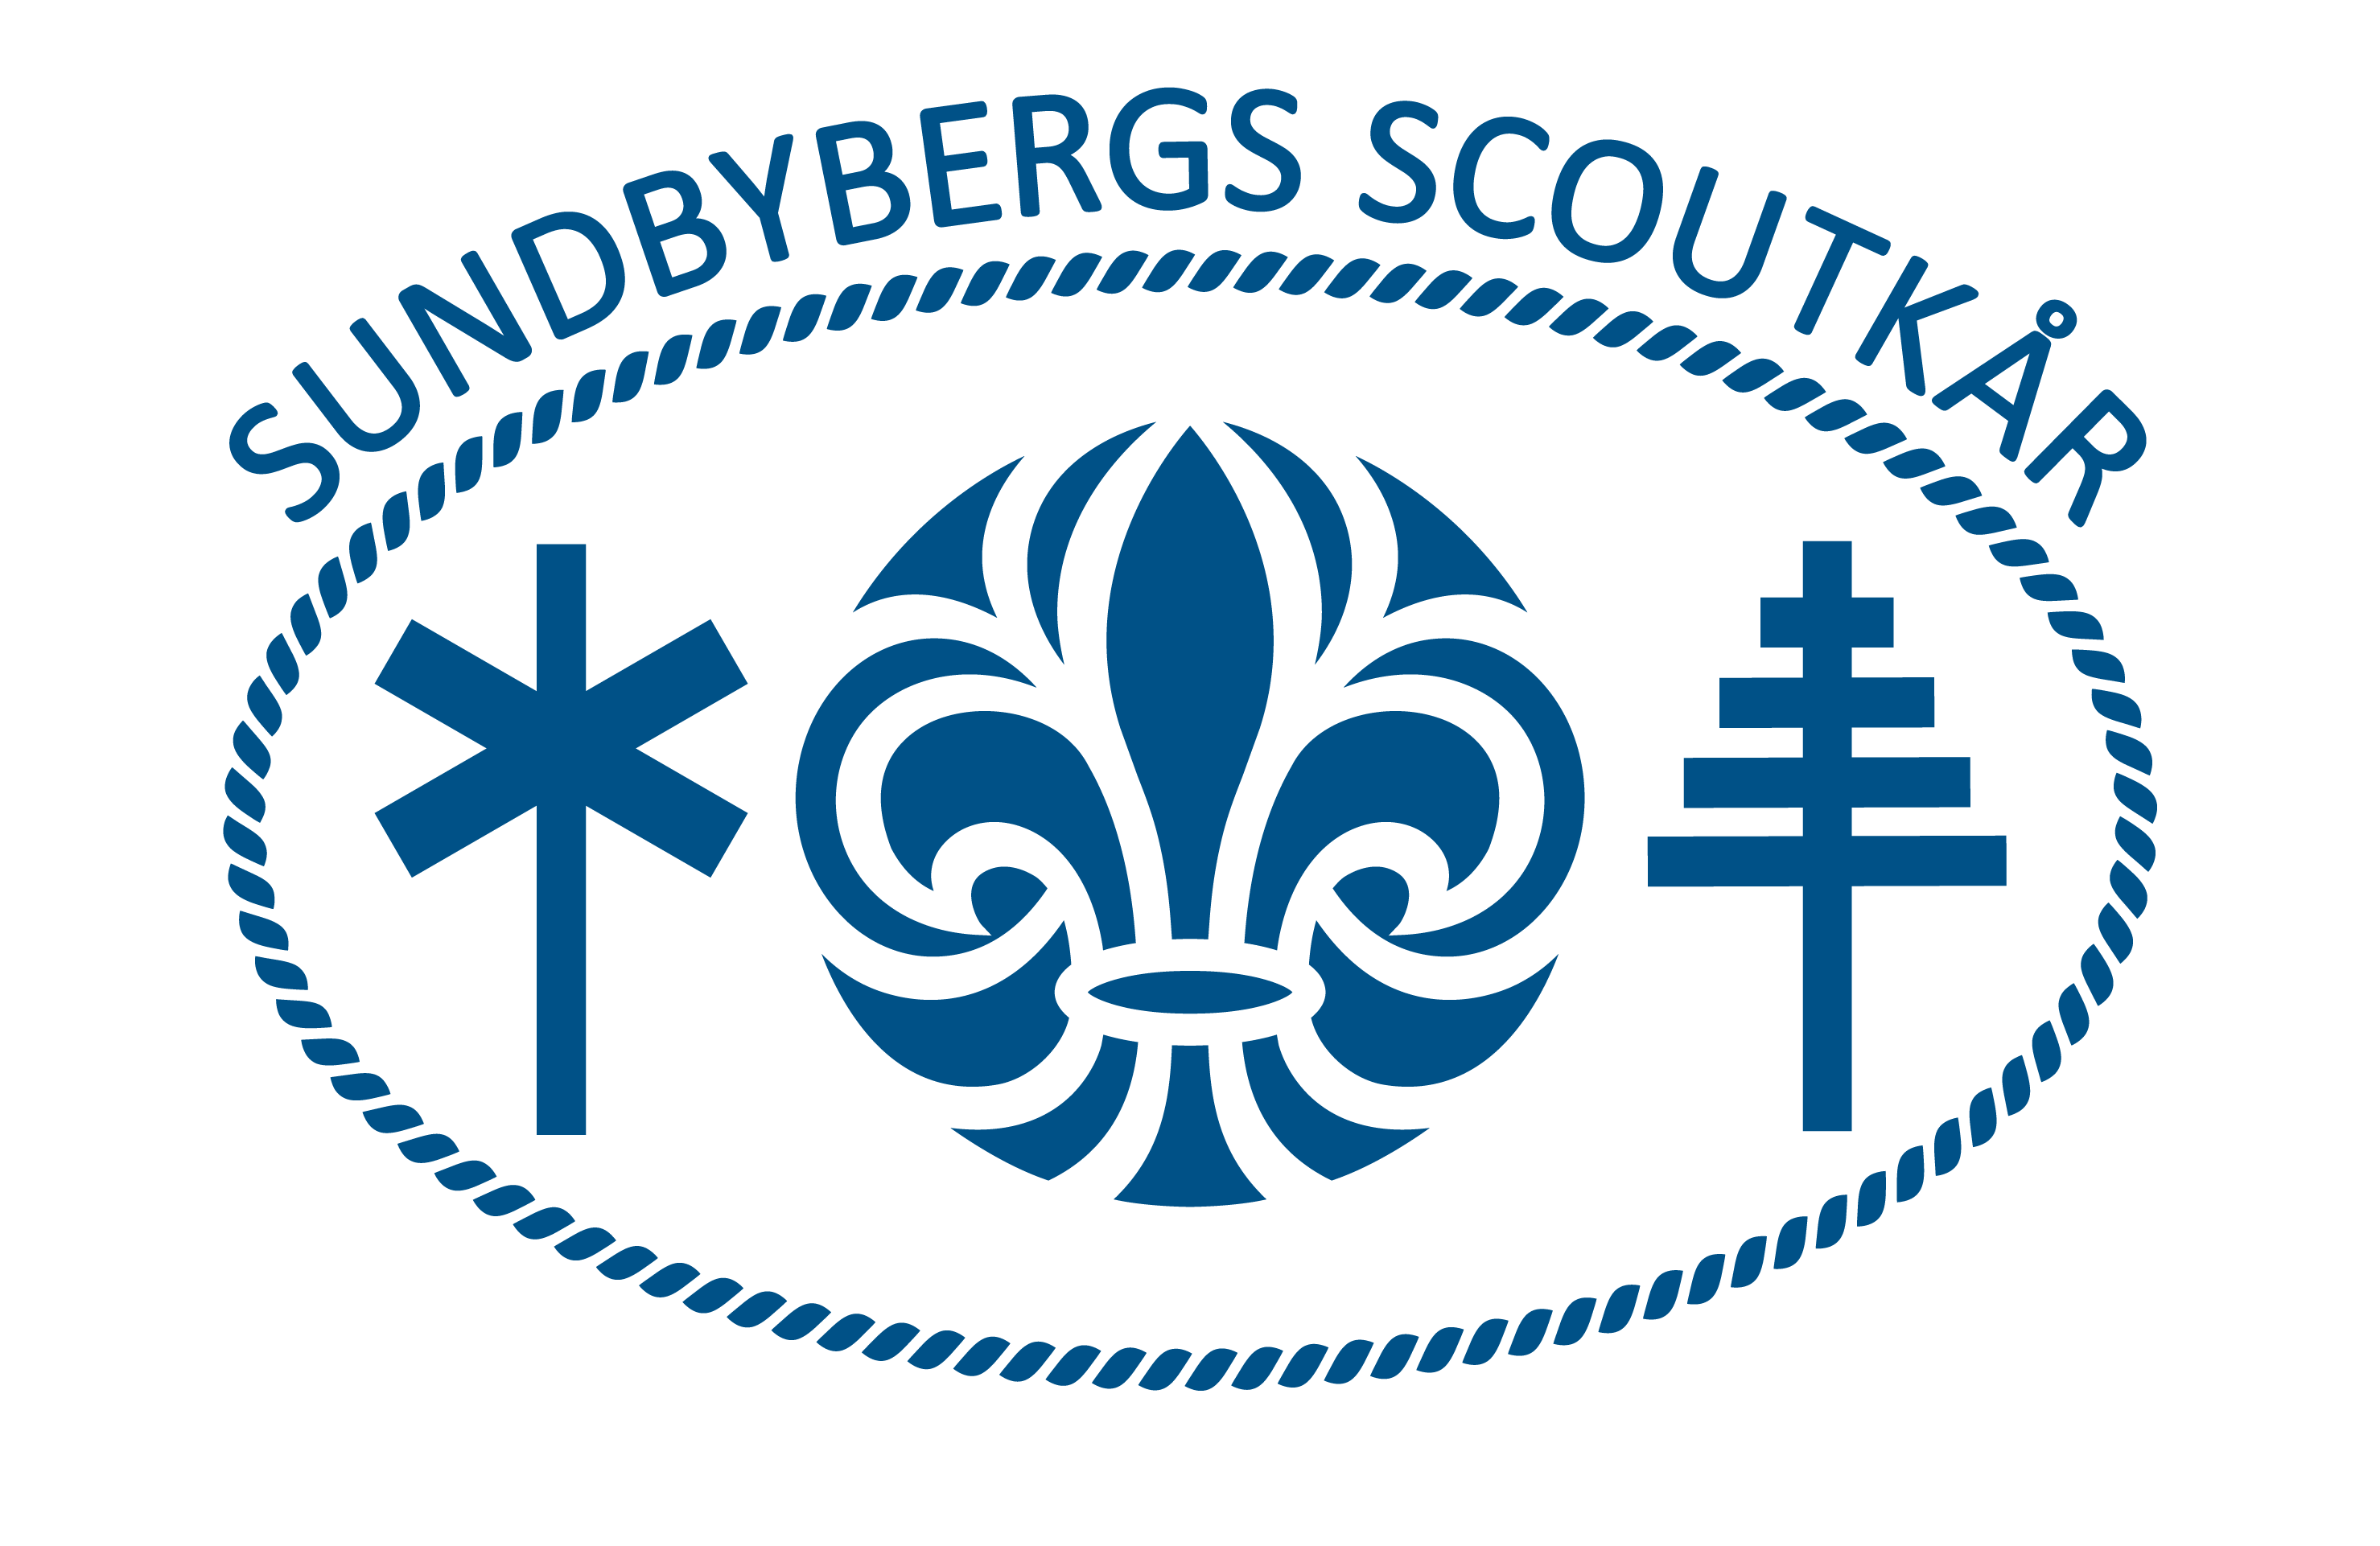 Sundbybergs scoutkår